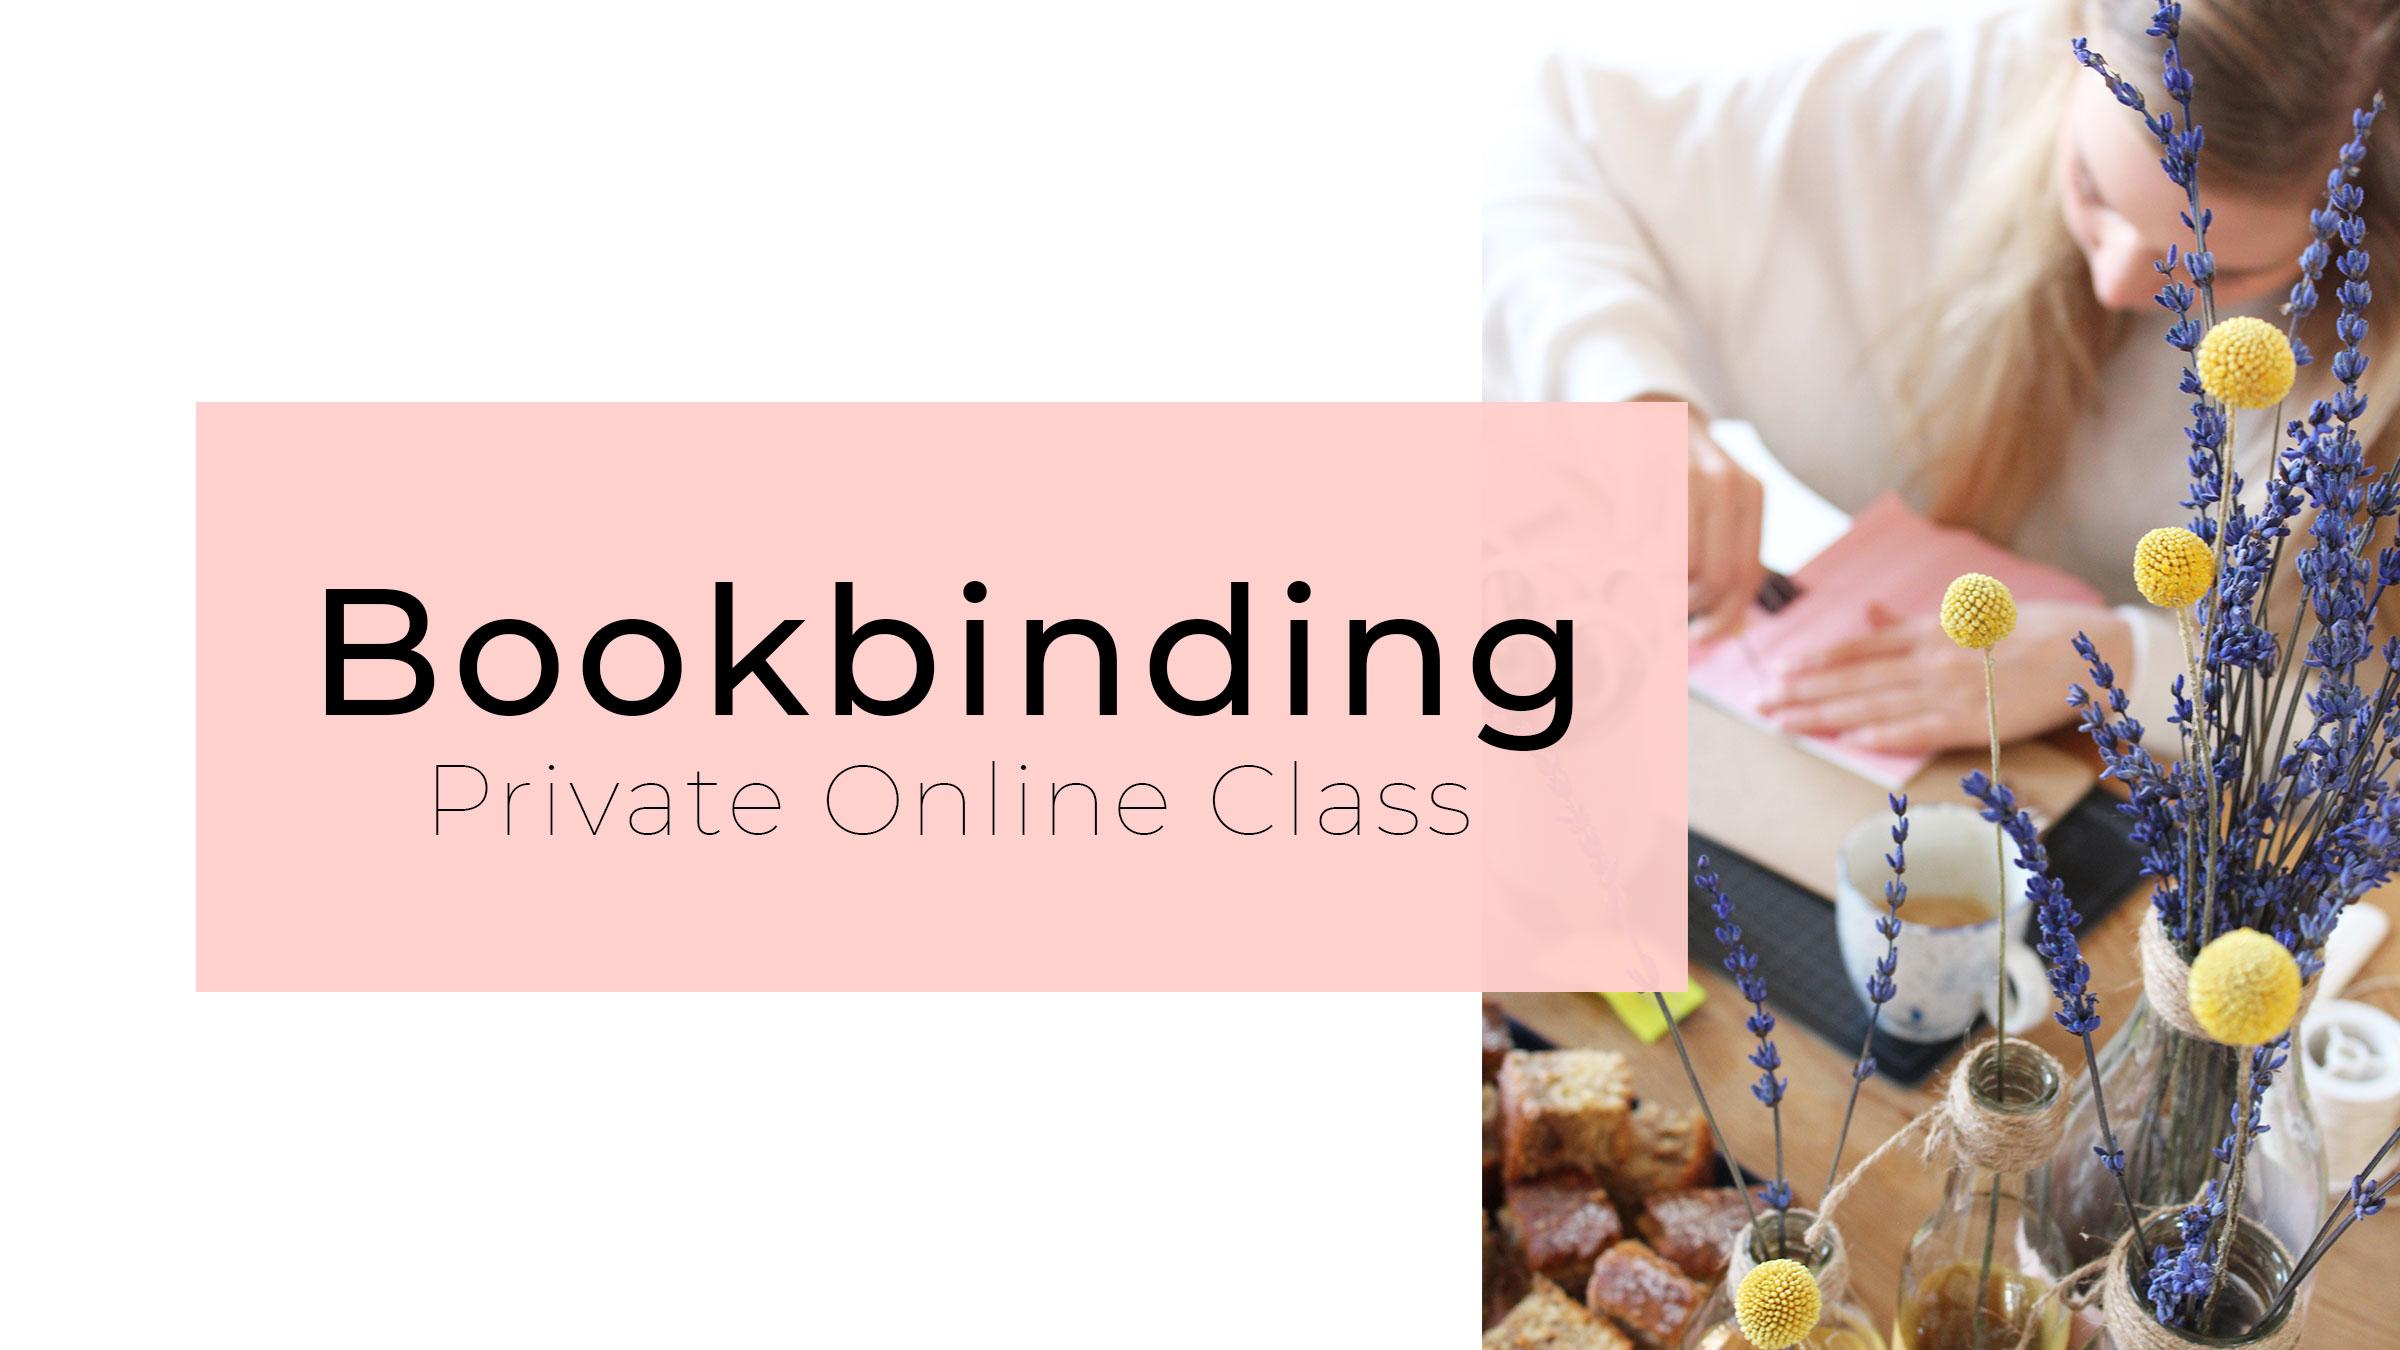 bookbinding-private-online-class-indigocraftroom-0